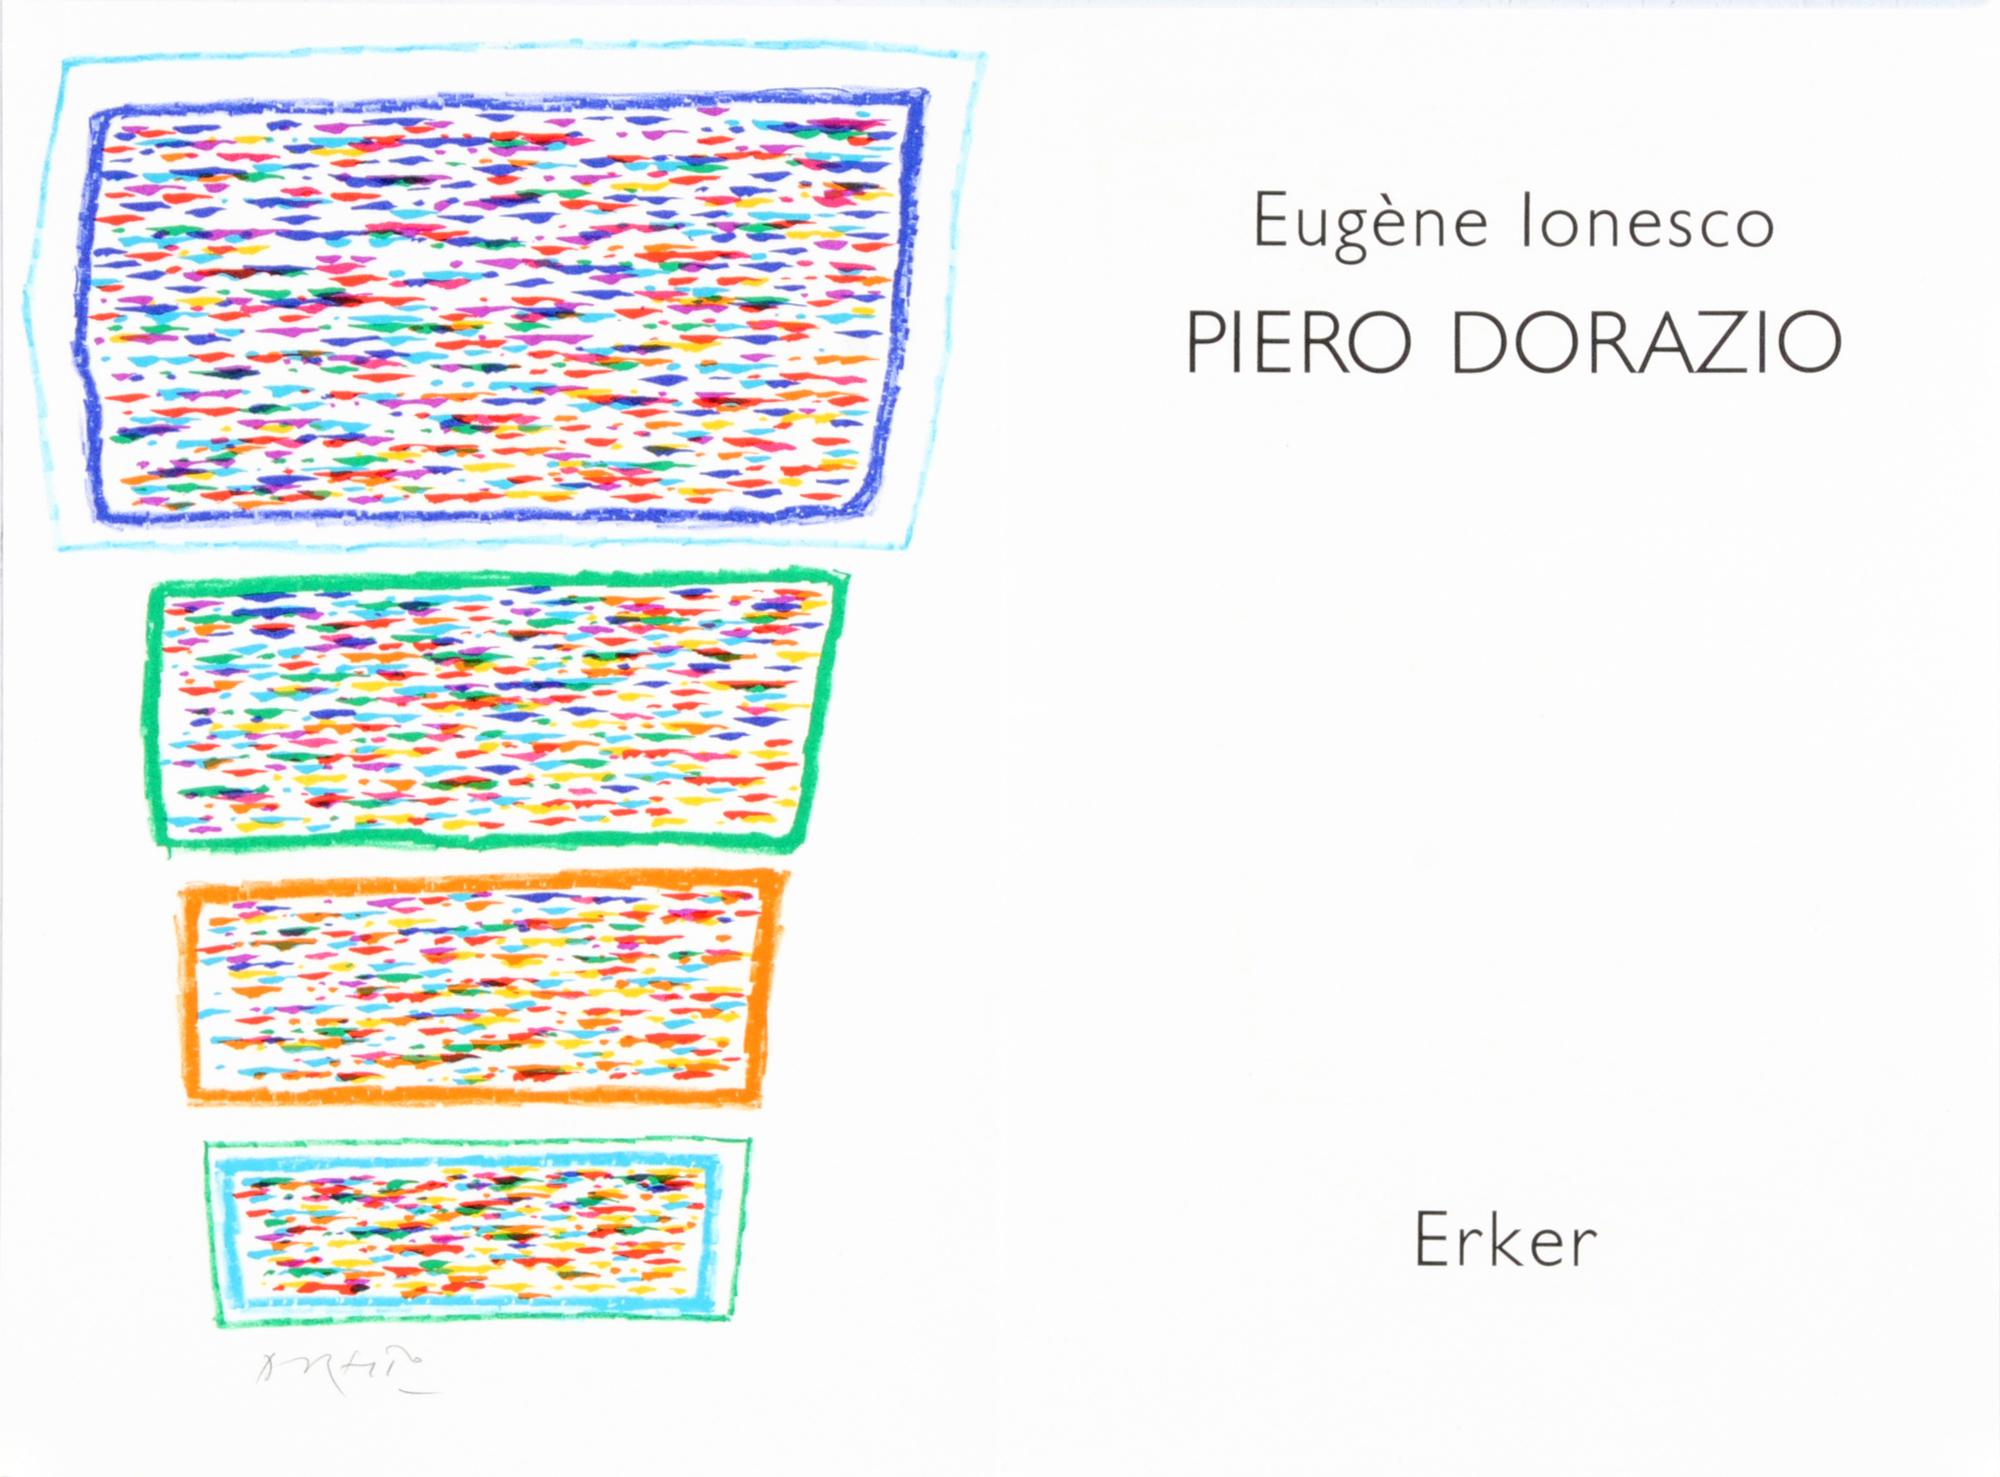 Dorazio Piero, Folder. Piero Dorazio